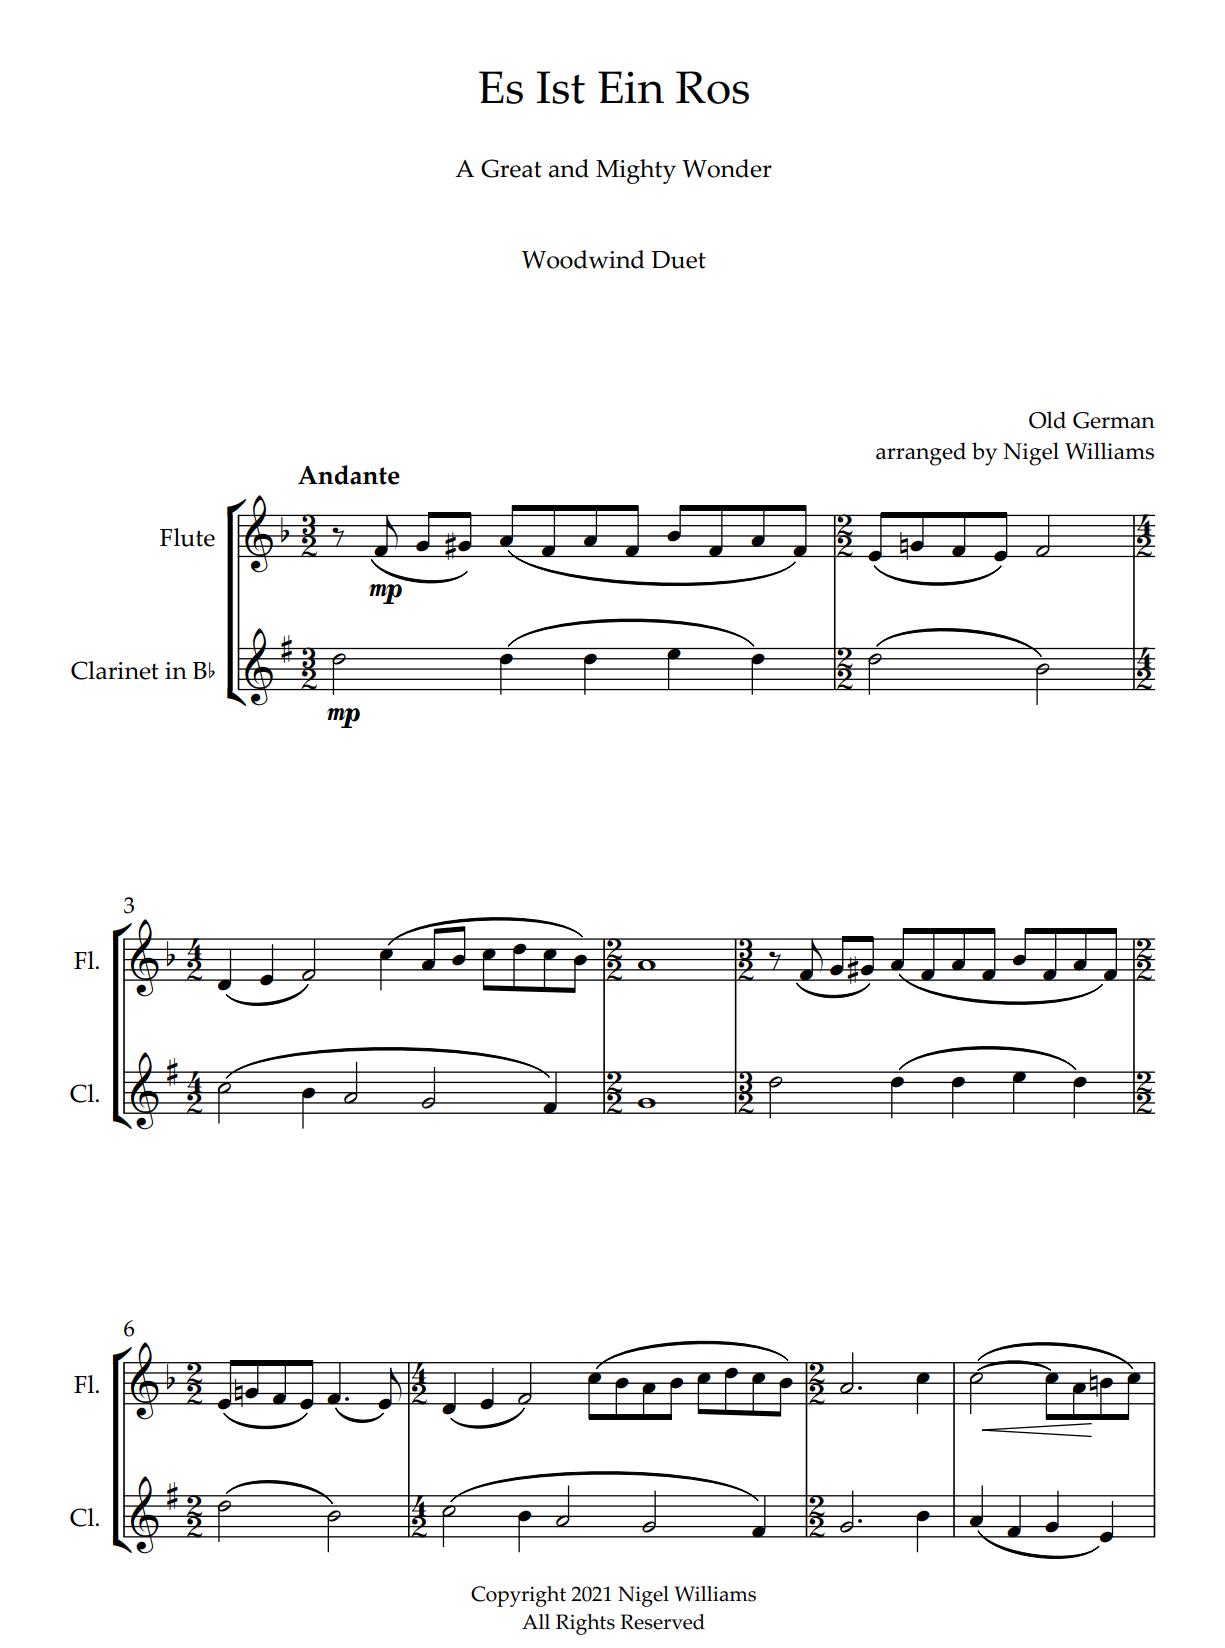 Es Ist Ein Ros, for Flute and Clarinet